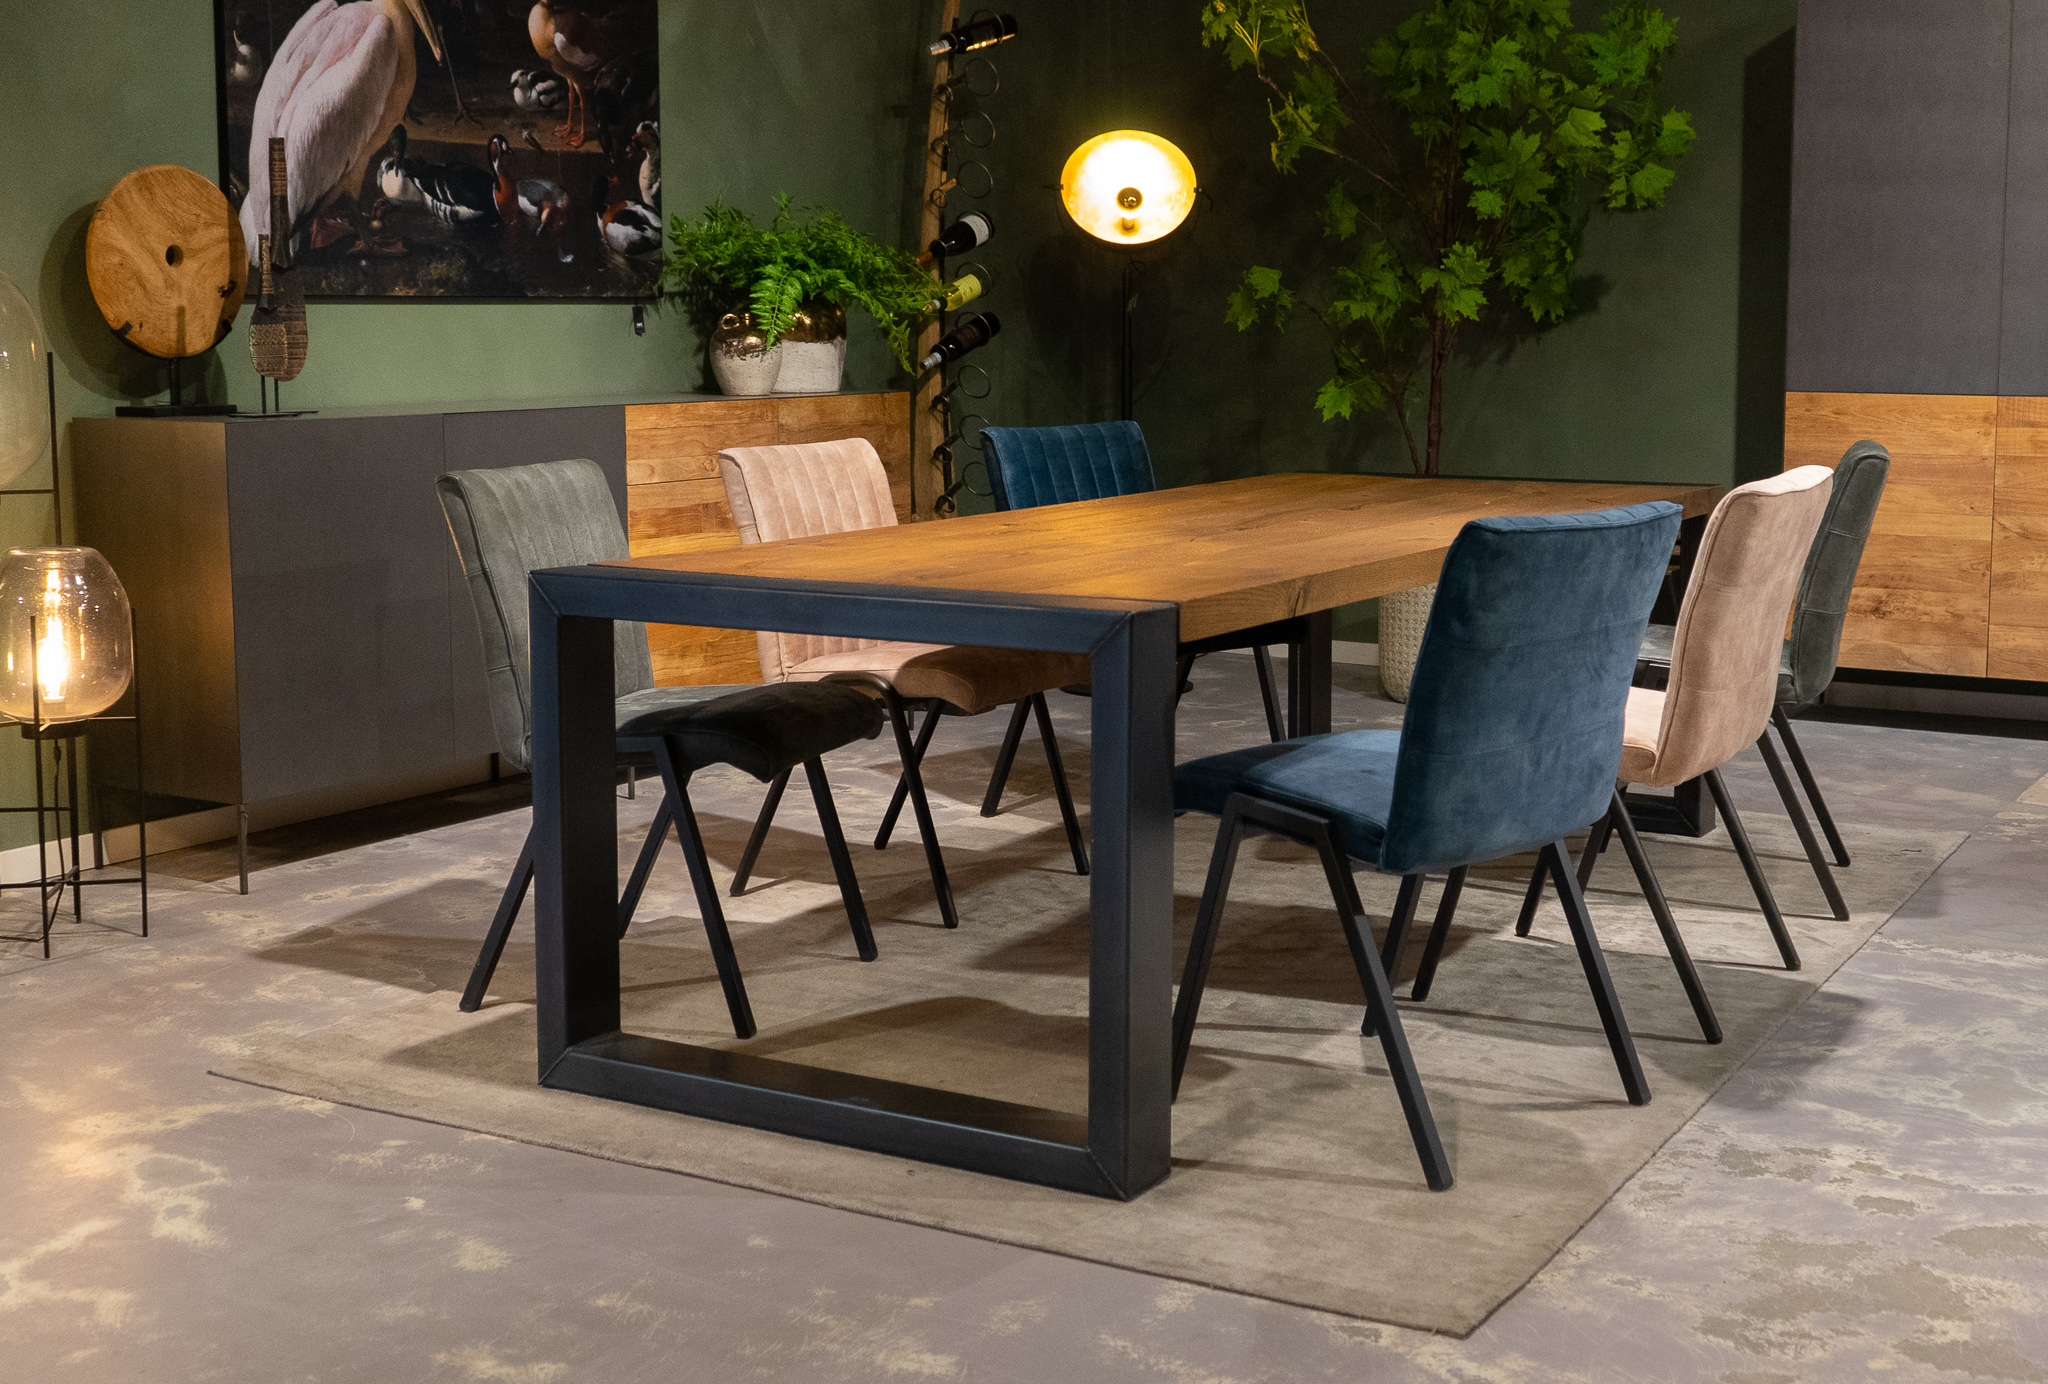 Grote stoere tafel